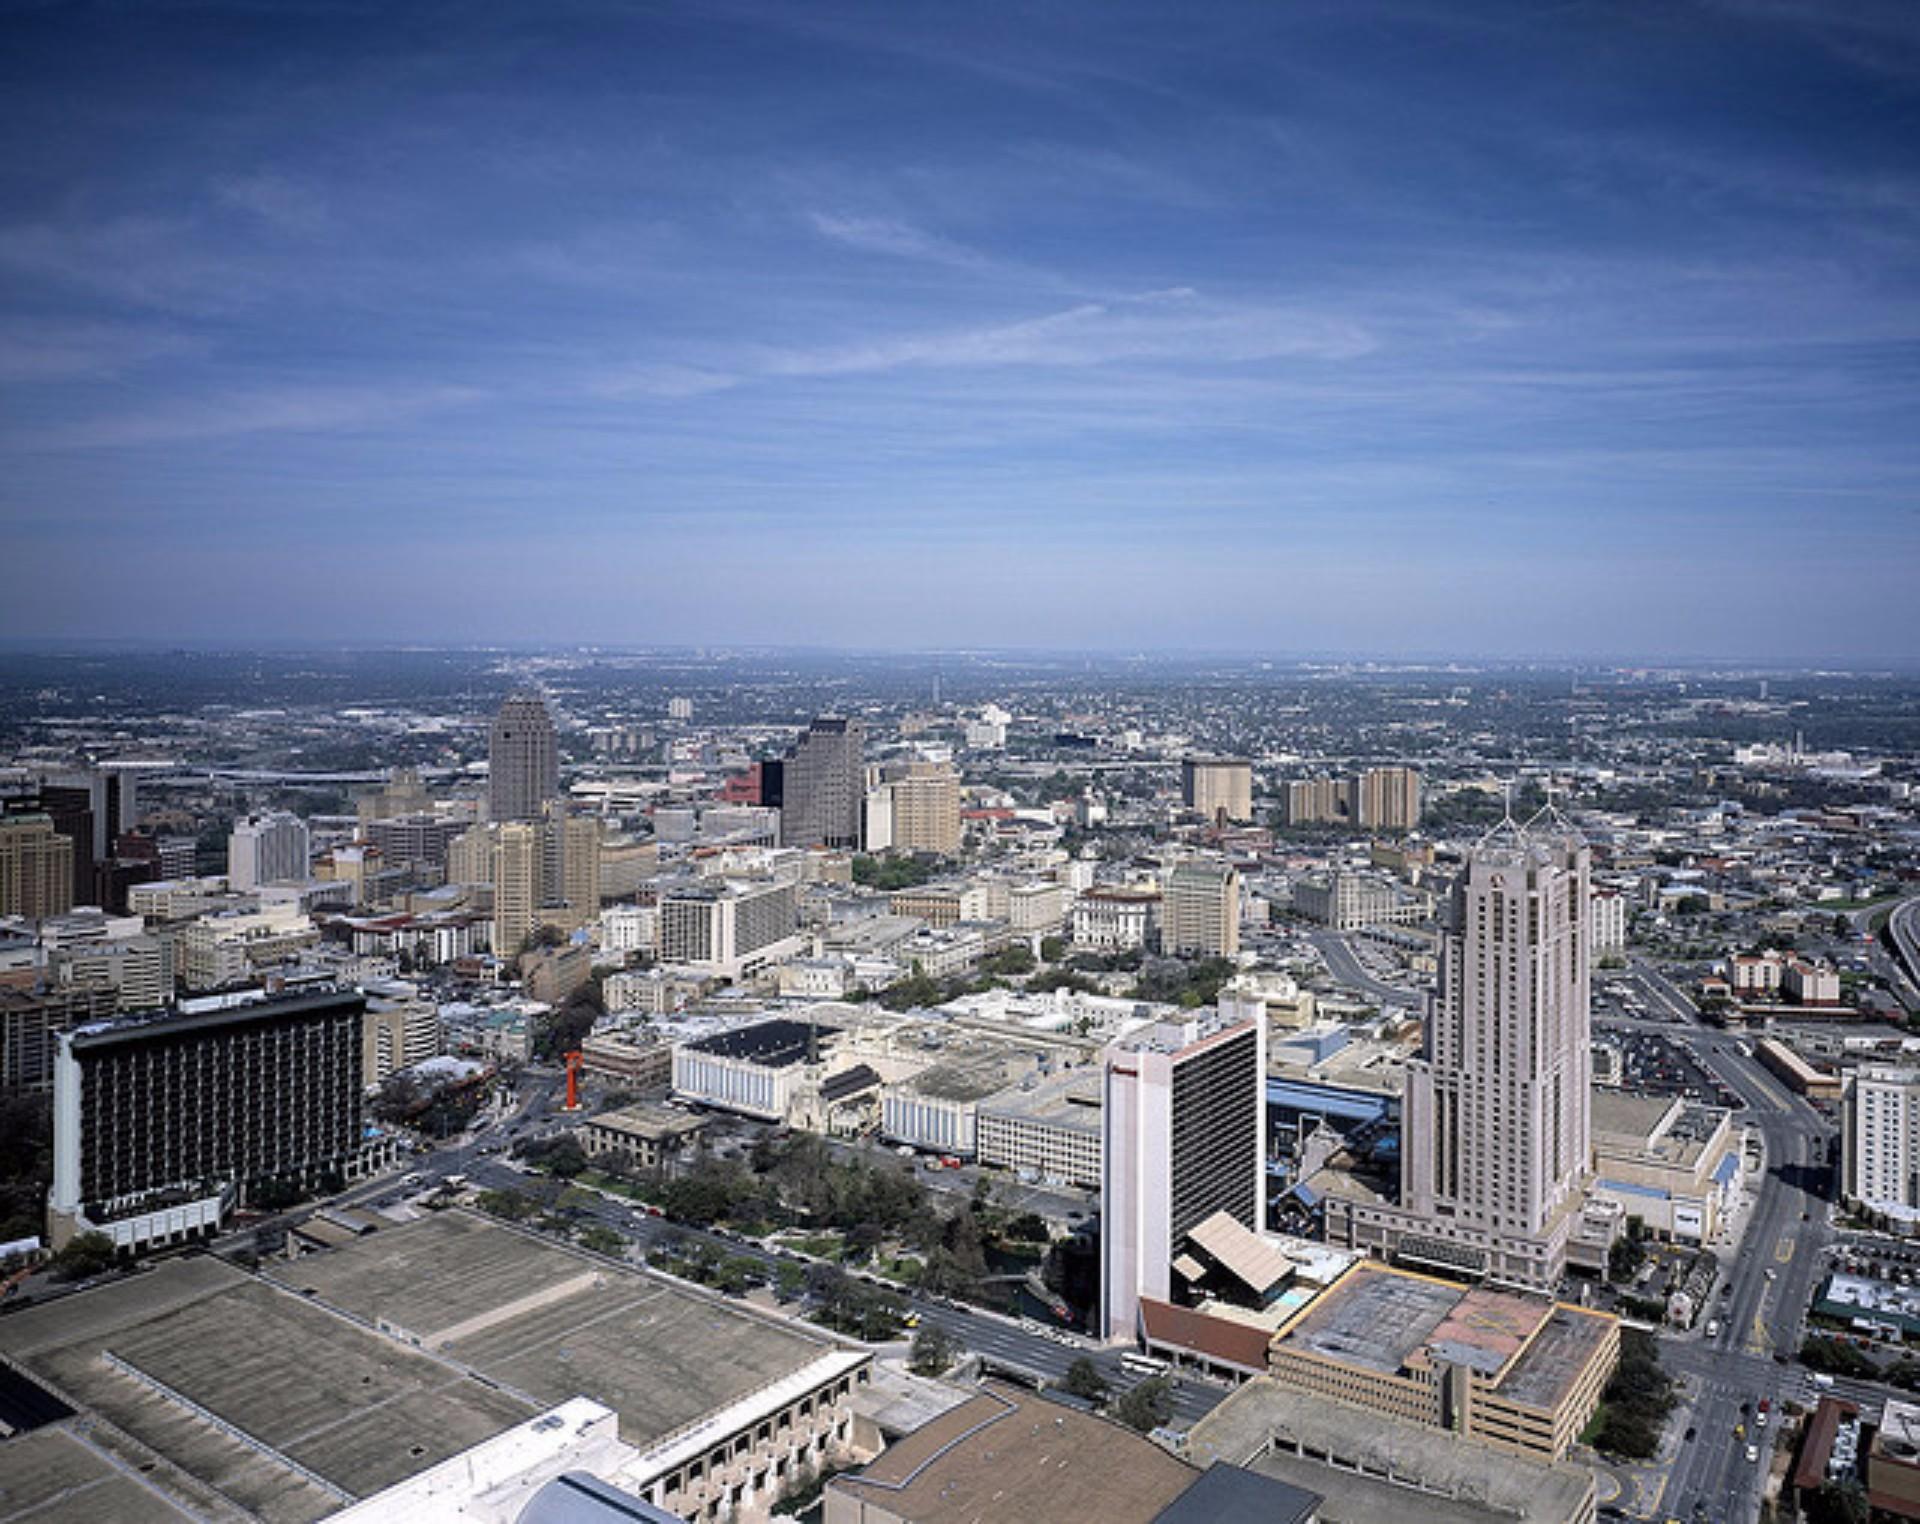 San Antonio Population in 2017